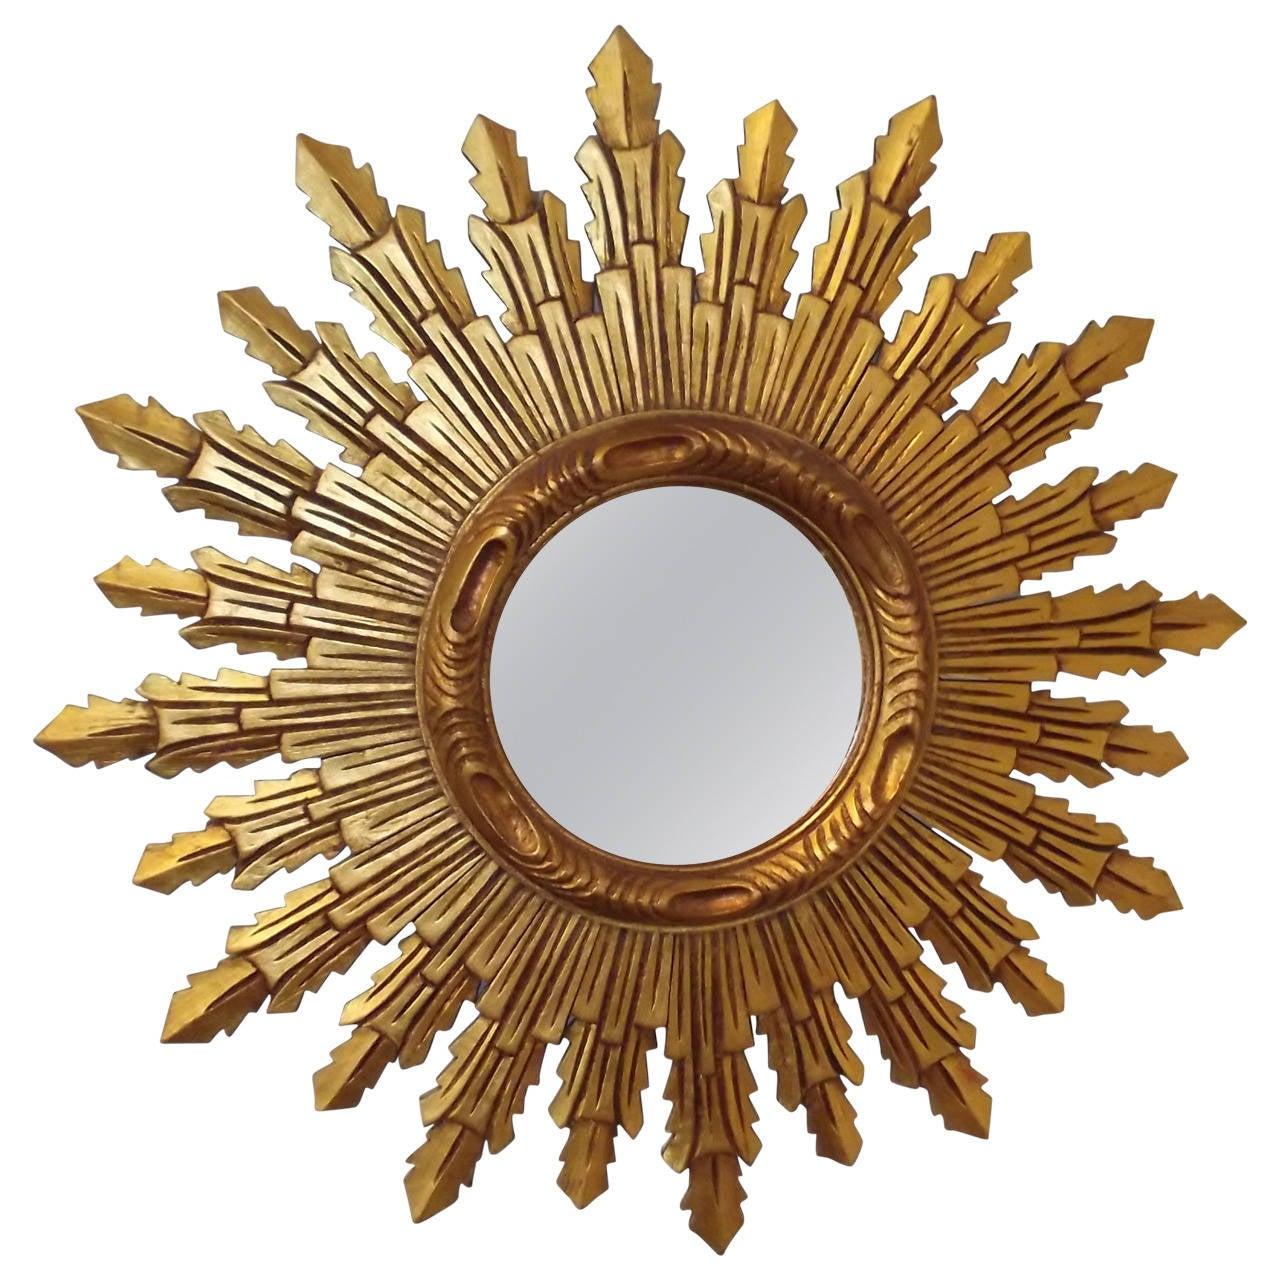 Wooden sunburst mirror at 1stdibs for Sunburst mirror